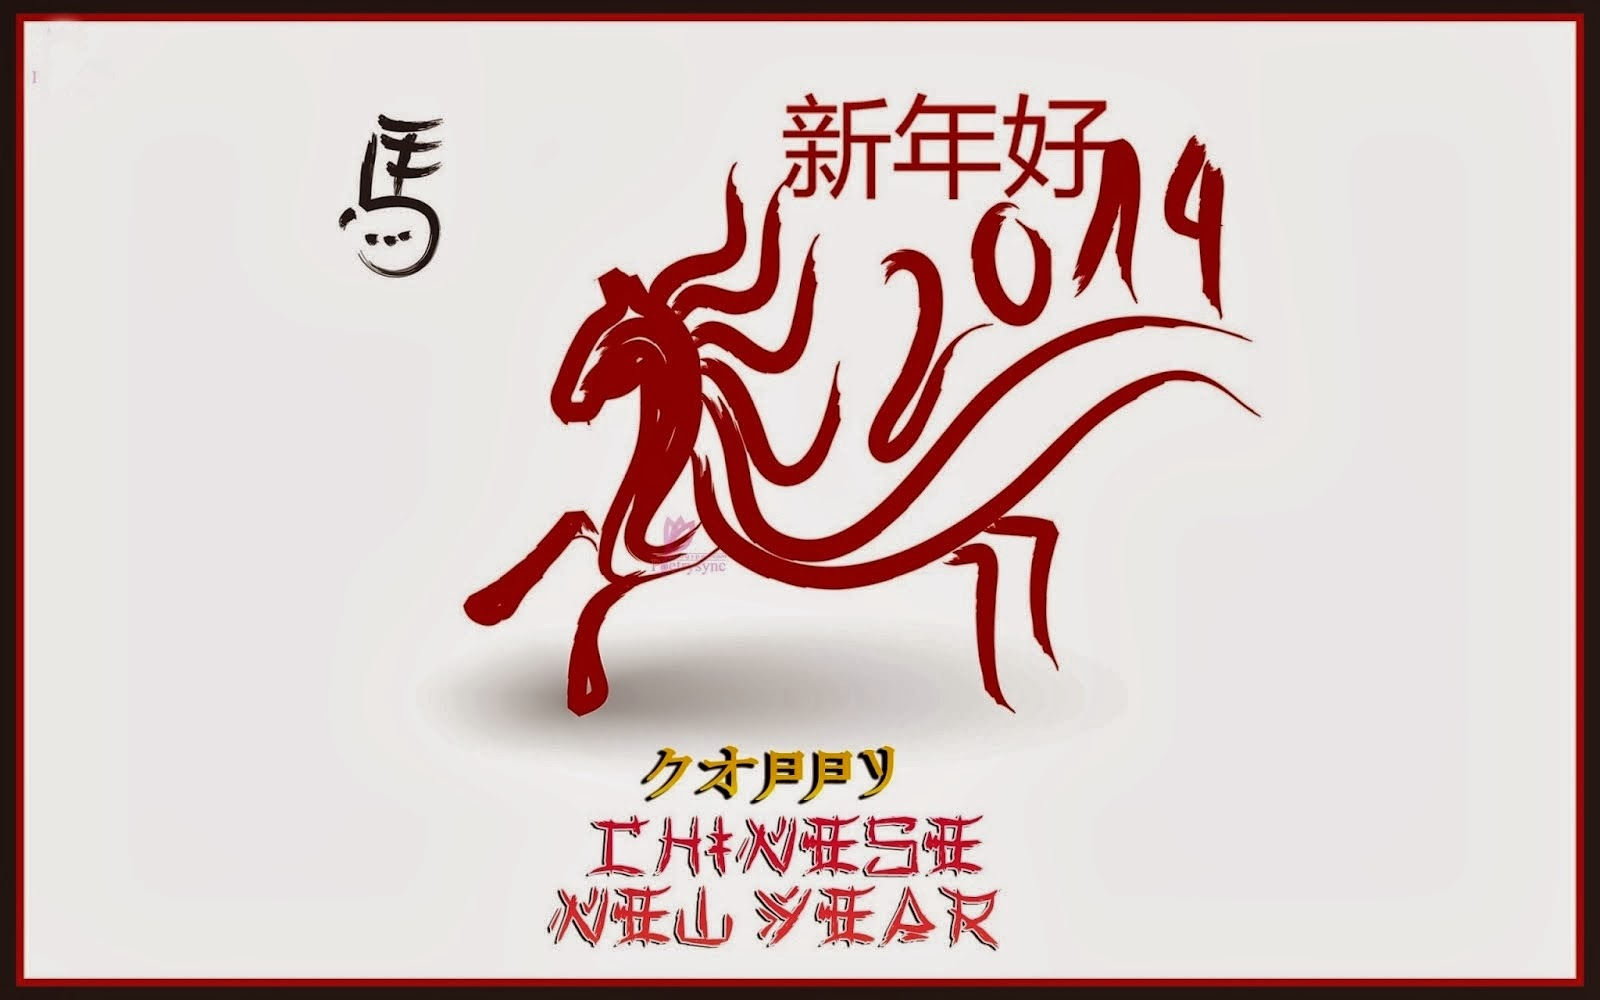 Kata ucapan tahun baru china imlek 2014